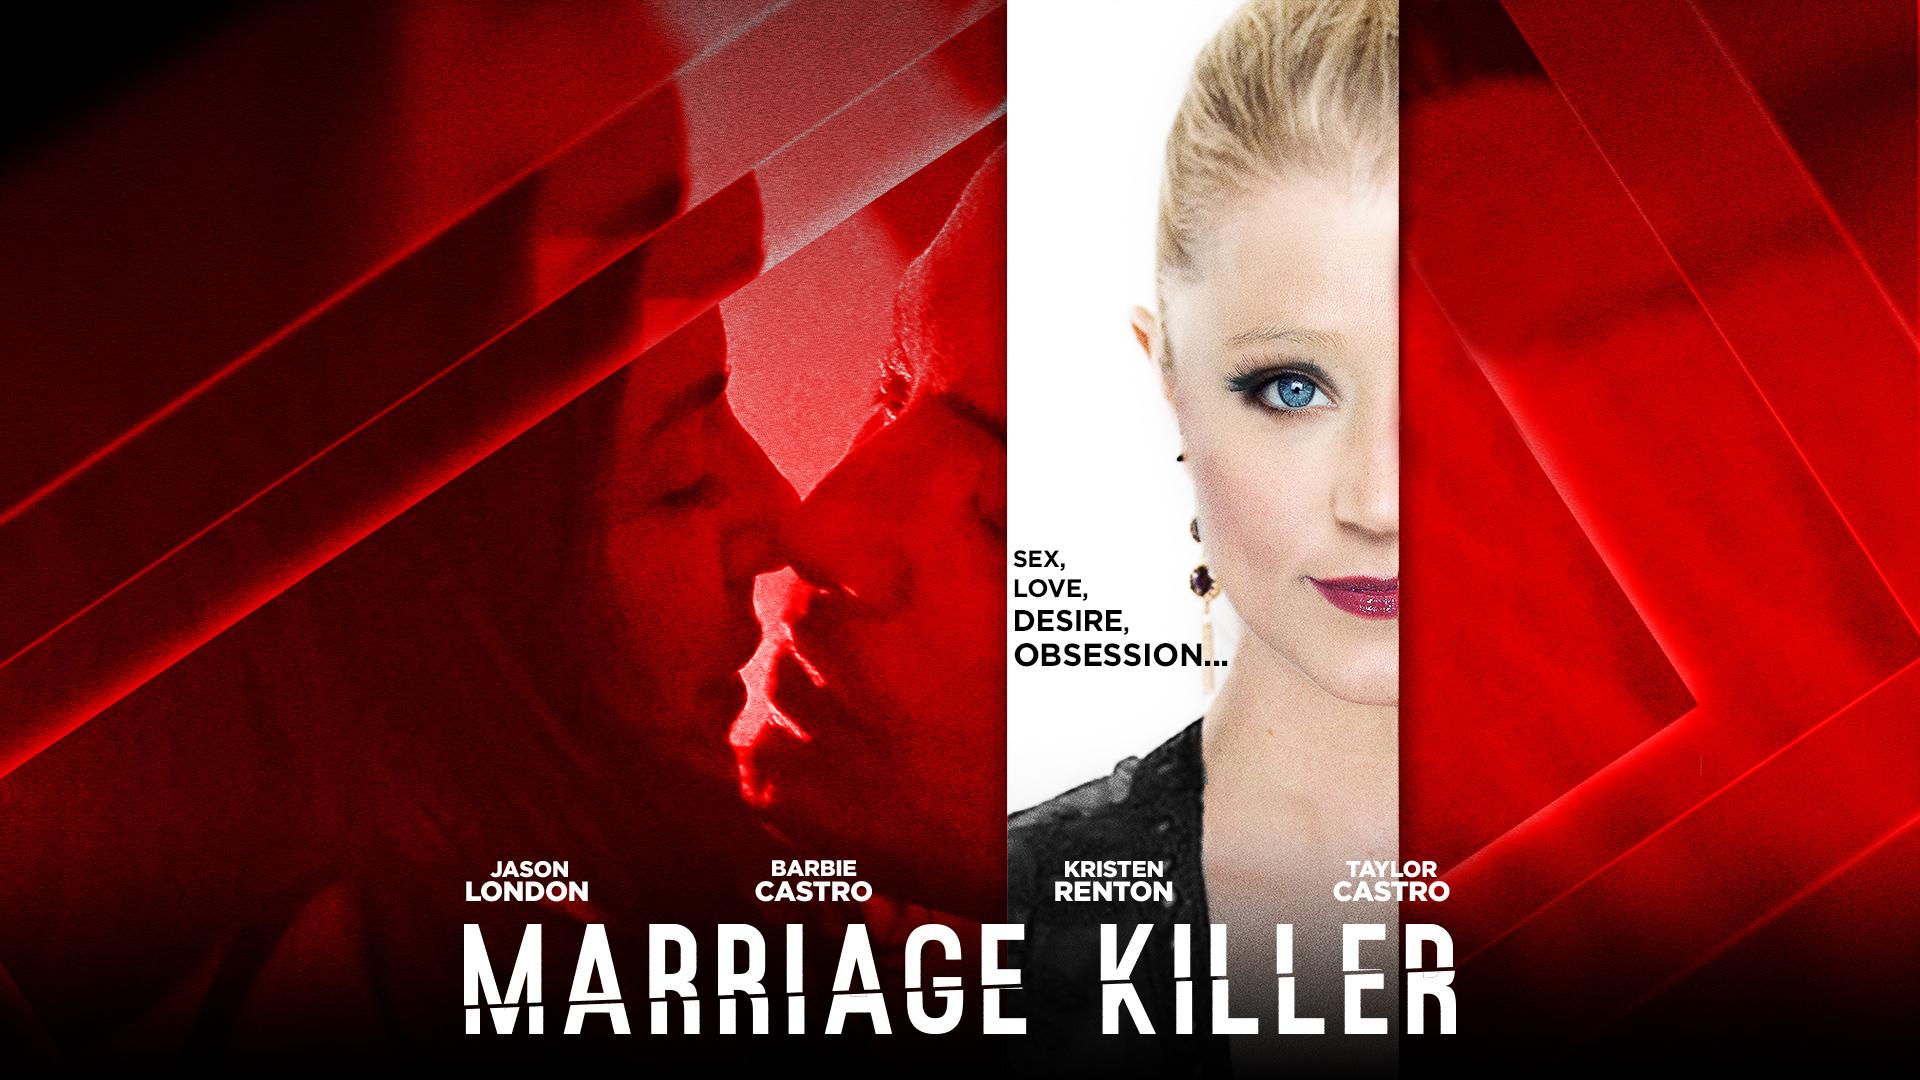 Marriage Killer